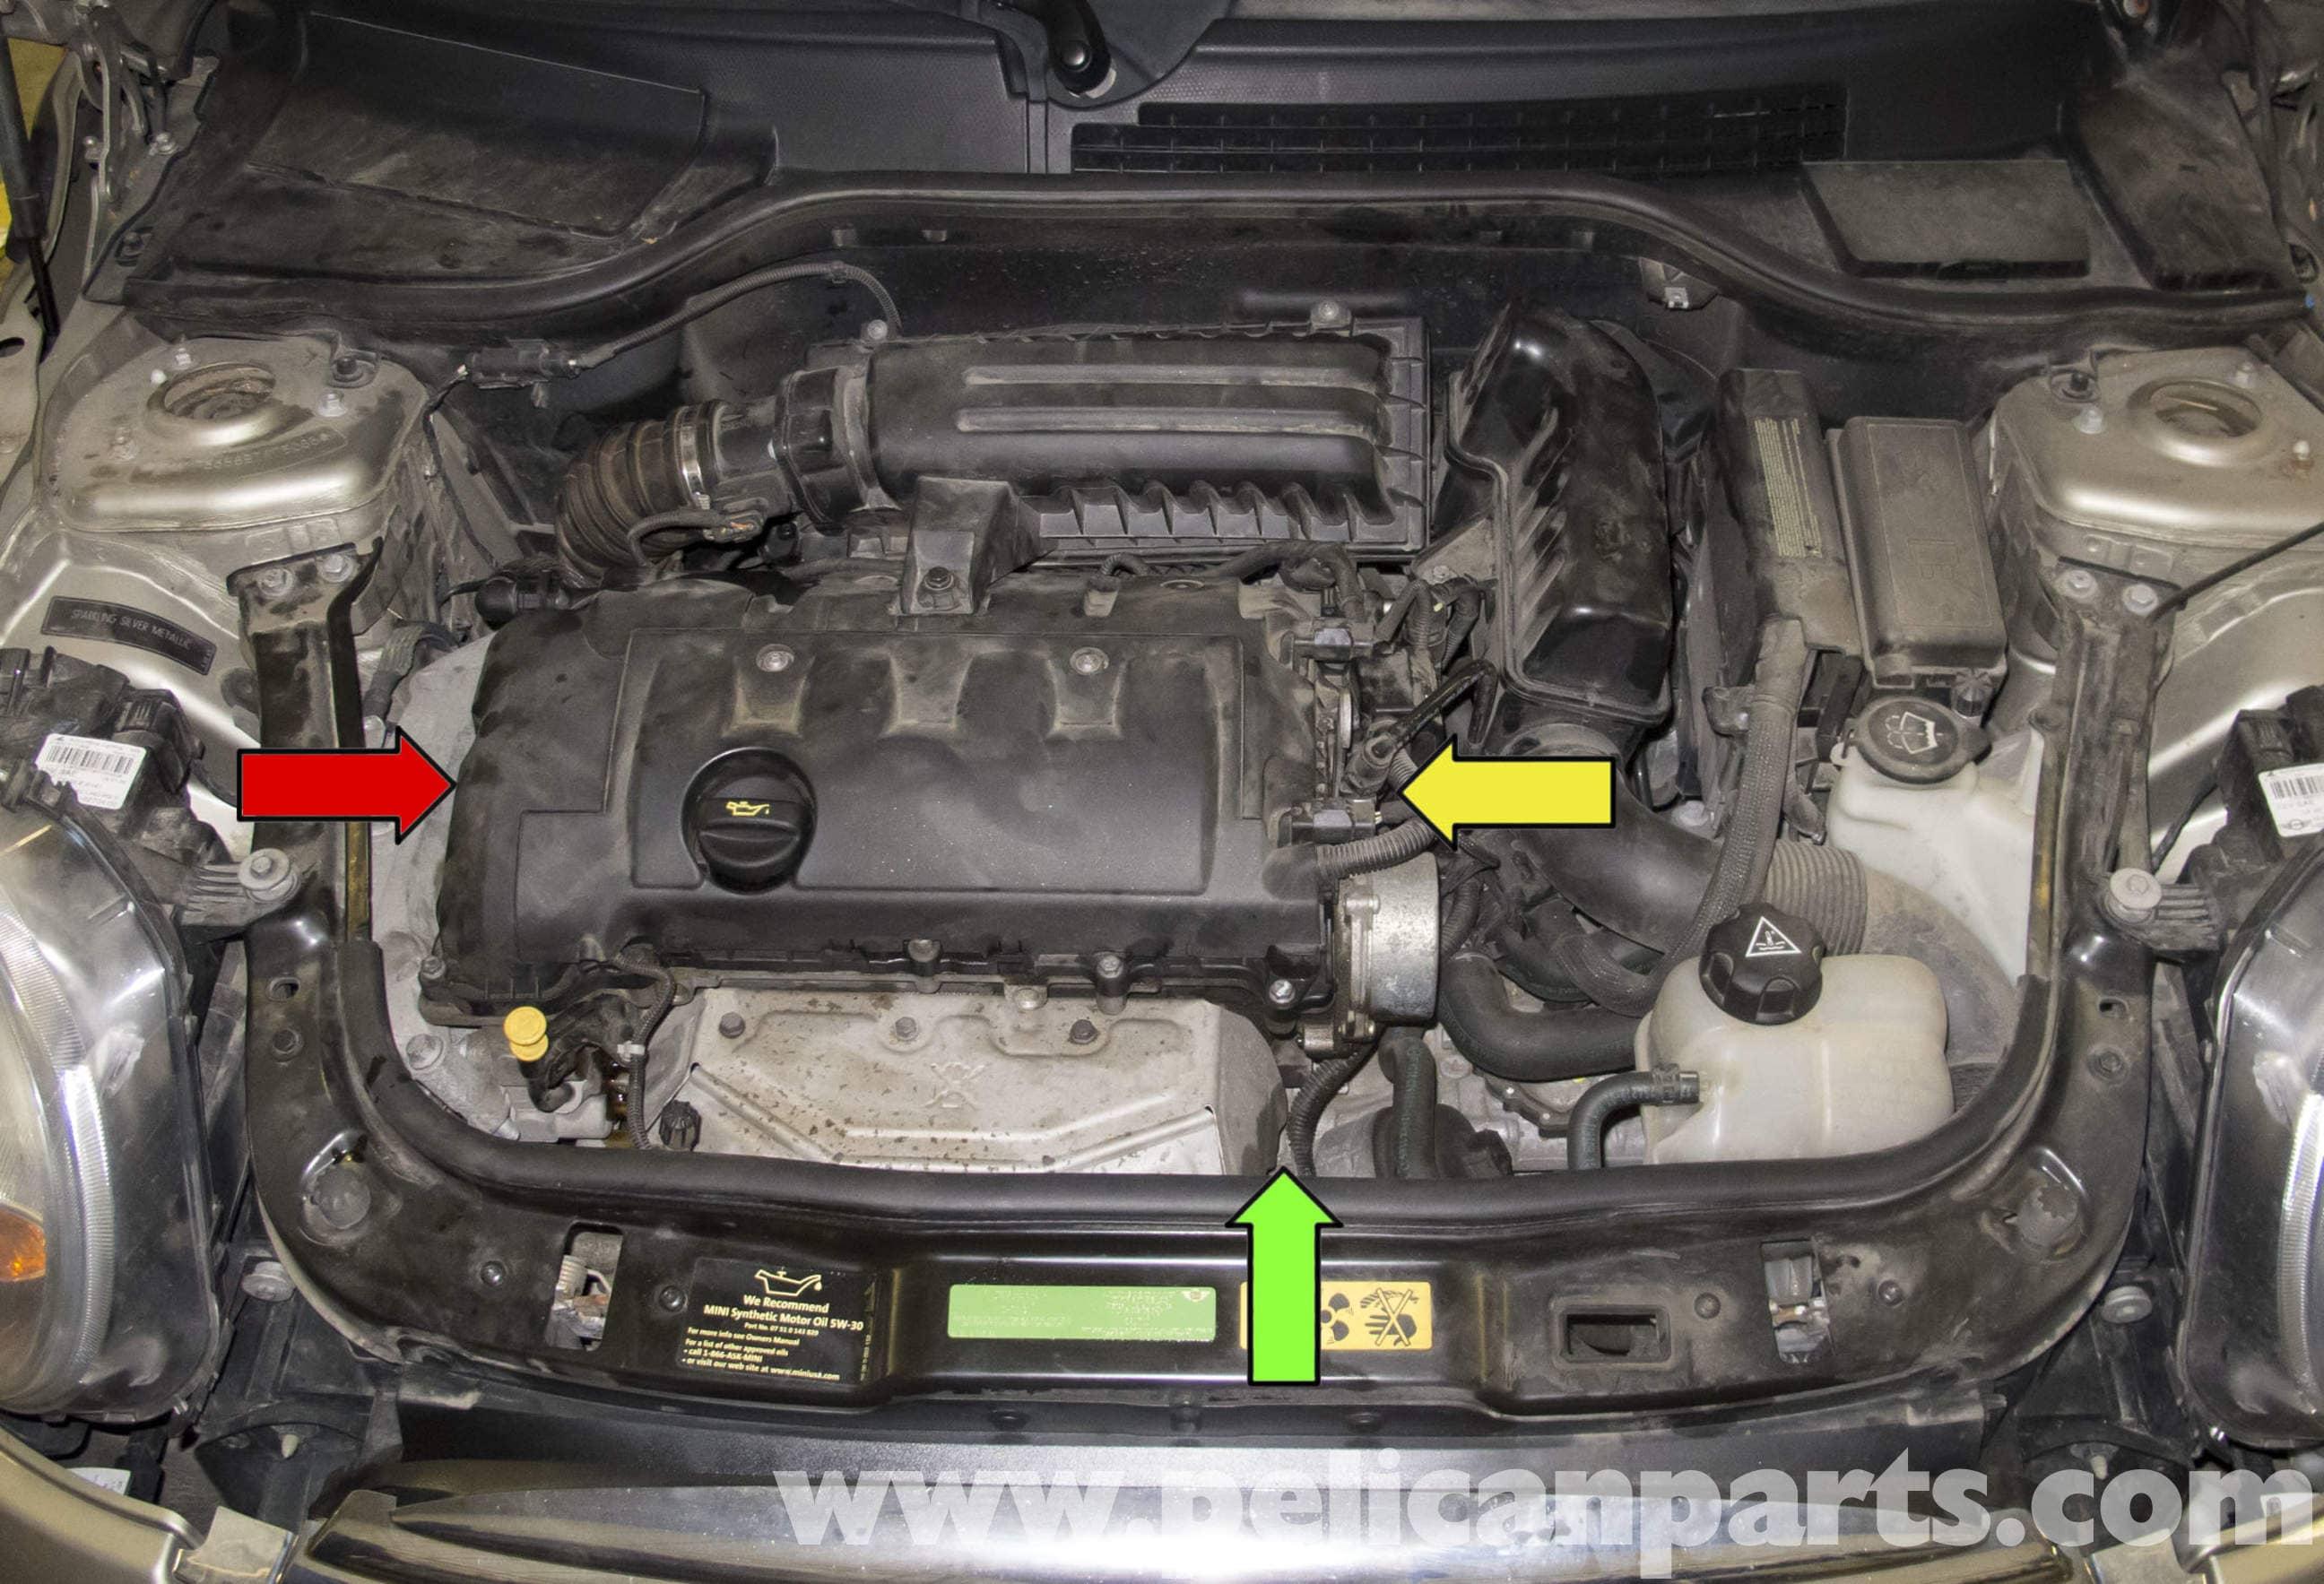 mini cooper  oil leak diagnosis   pelican parts diy maintenance article